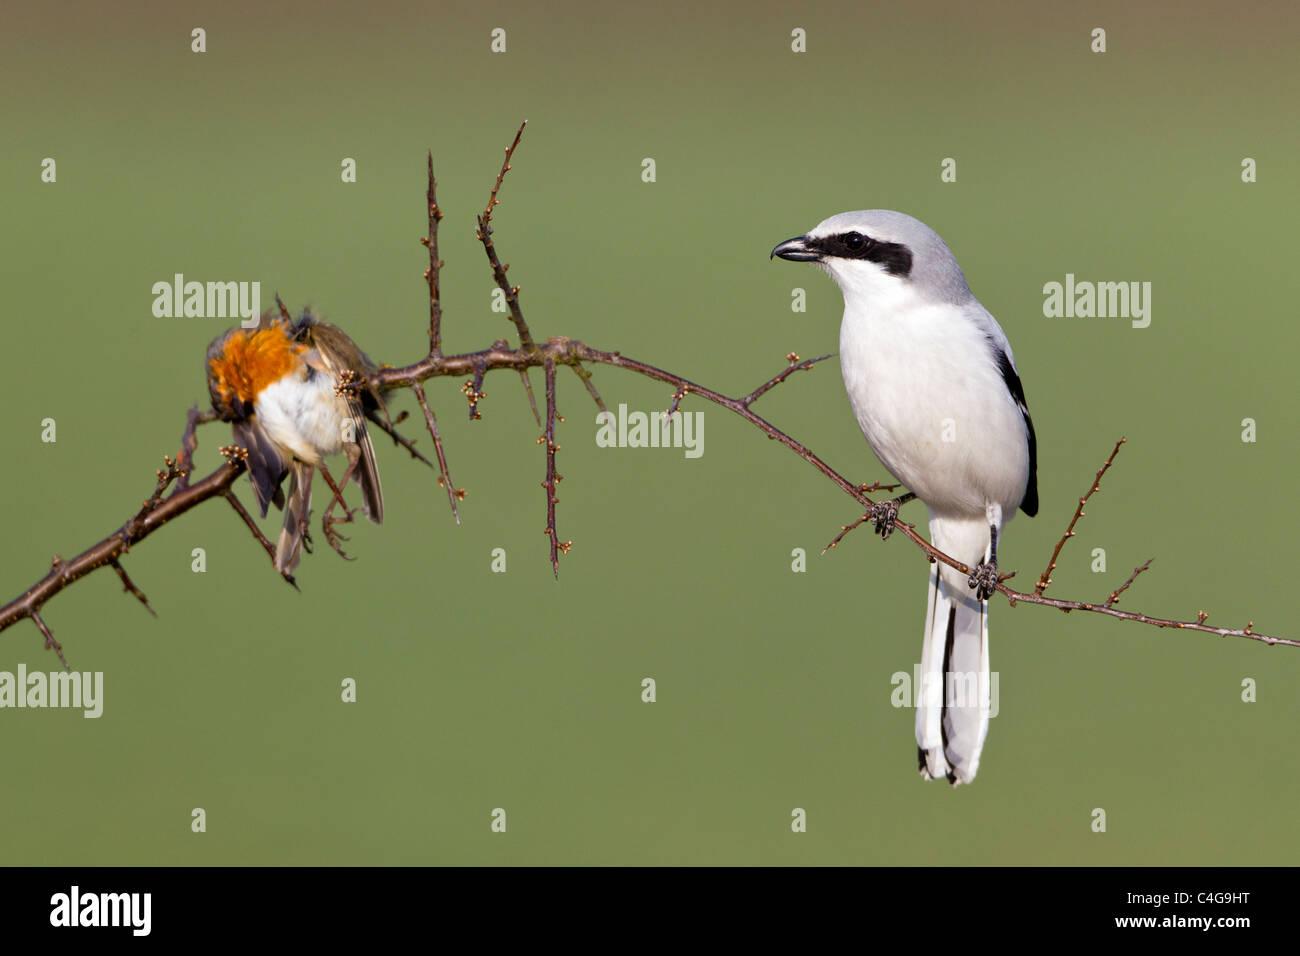 Greay grande migratrice (Lanius excubitor), perché sur branche, qui s'empala robin, Basse-Saxe, Allemagne Photo Stock